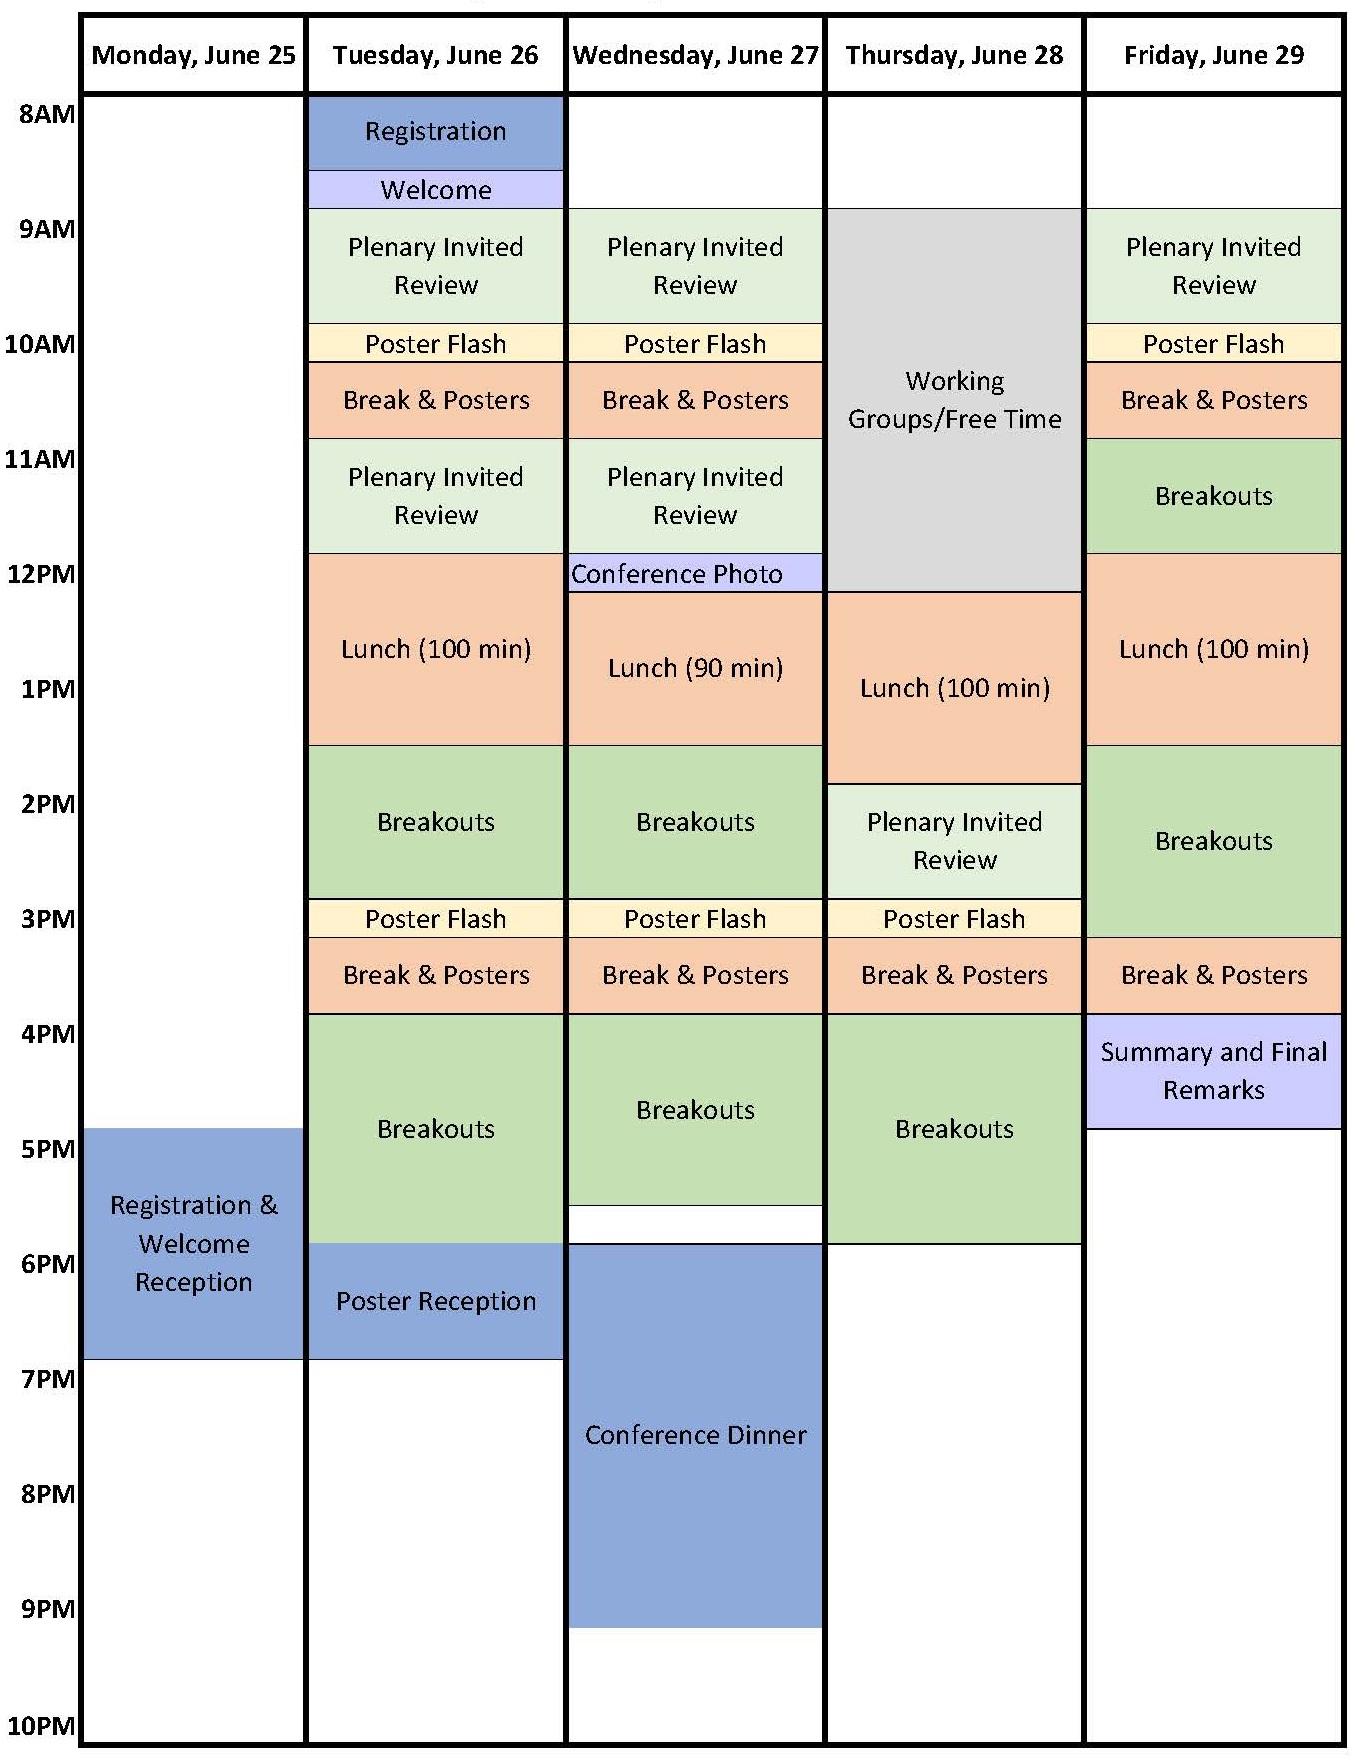 ngVLA18 program draft 2